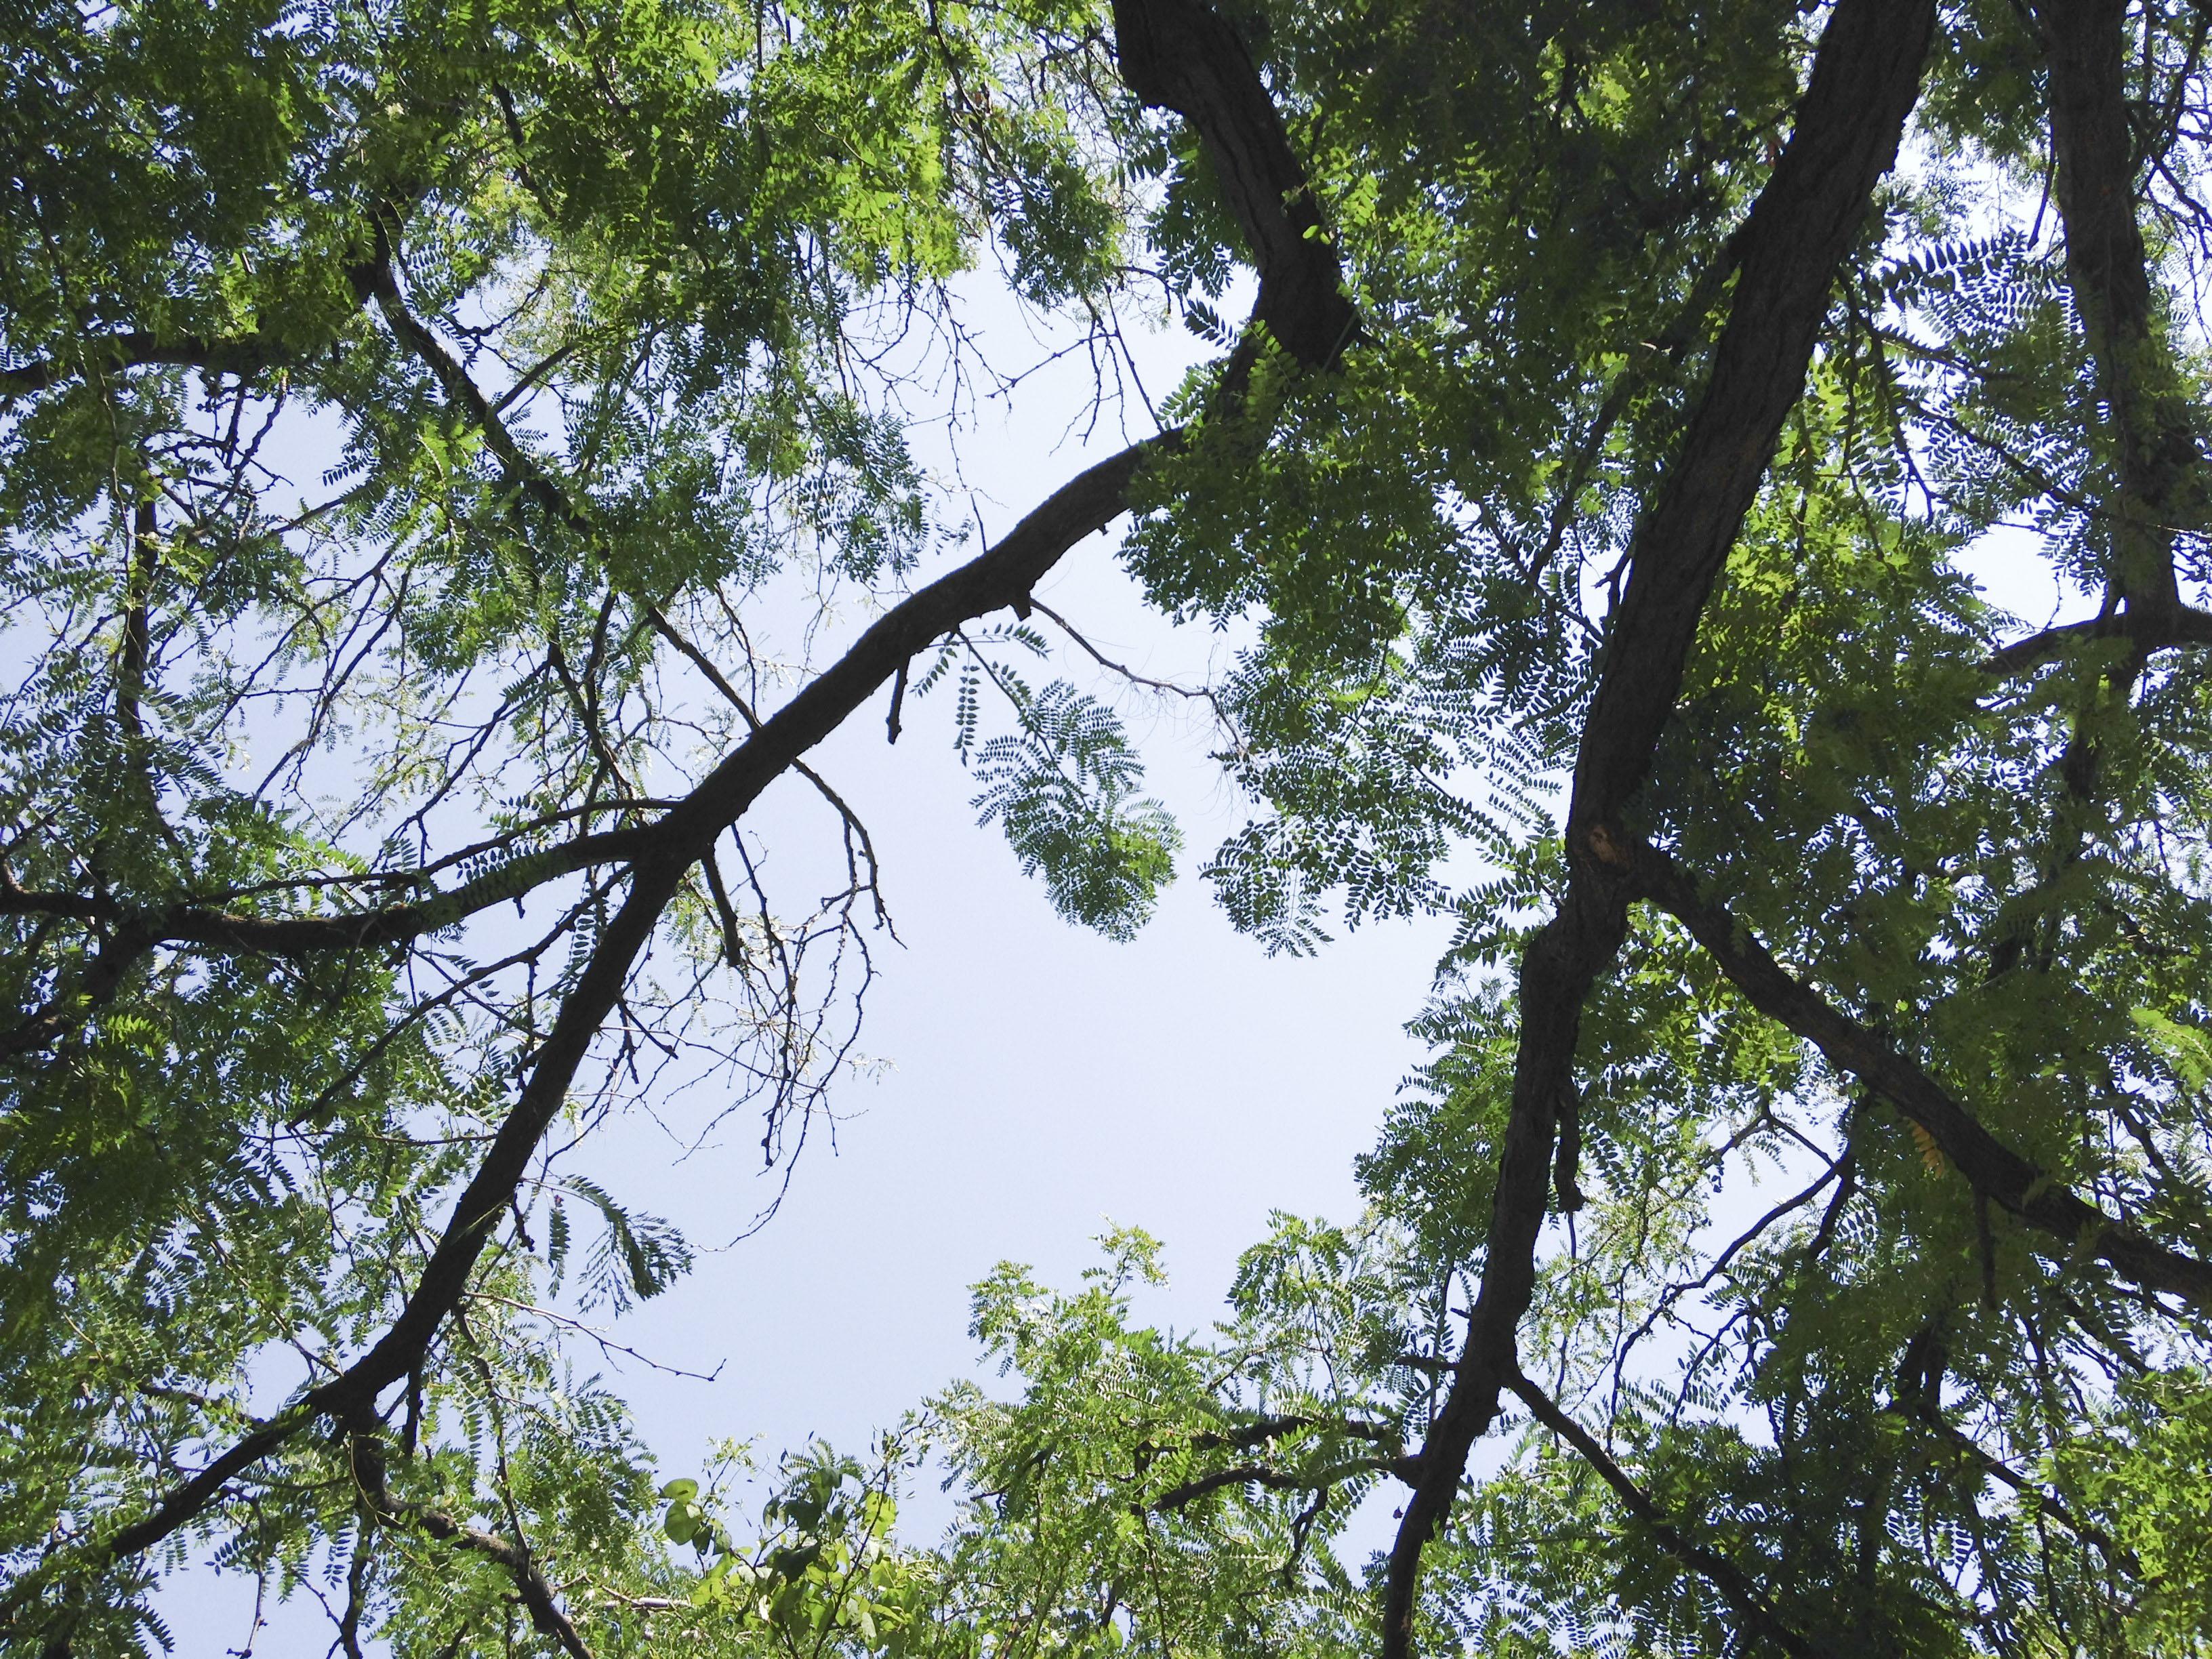 Honeylocust canopy.